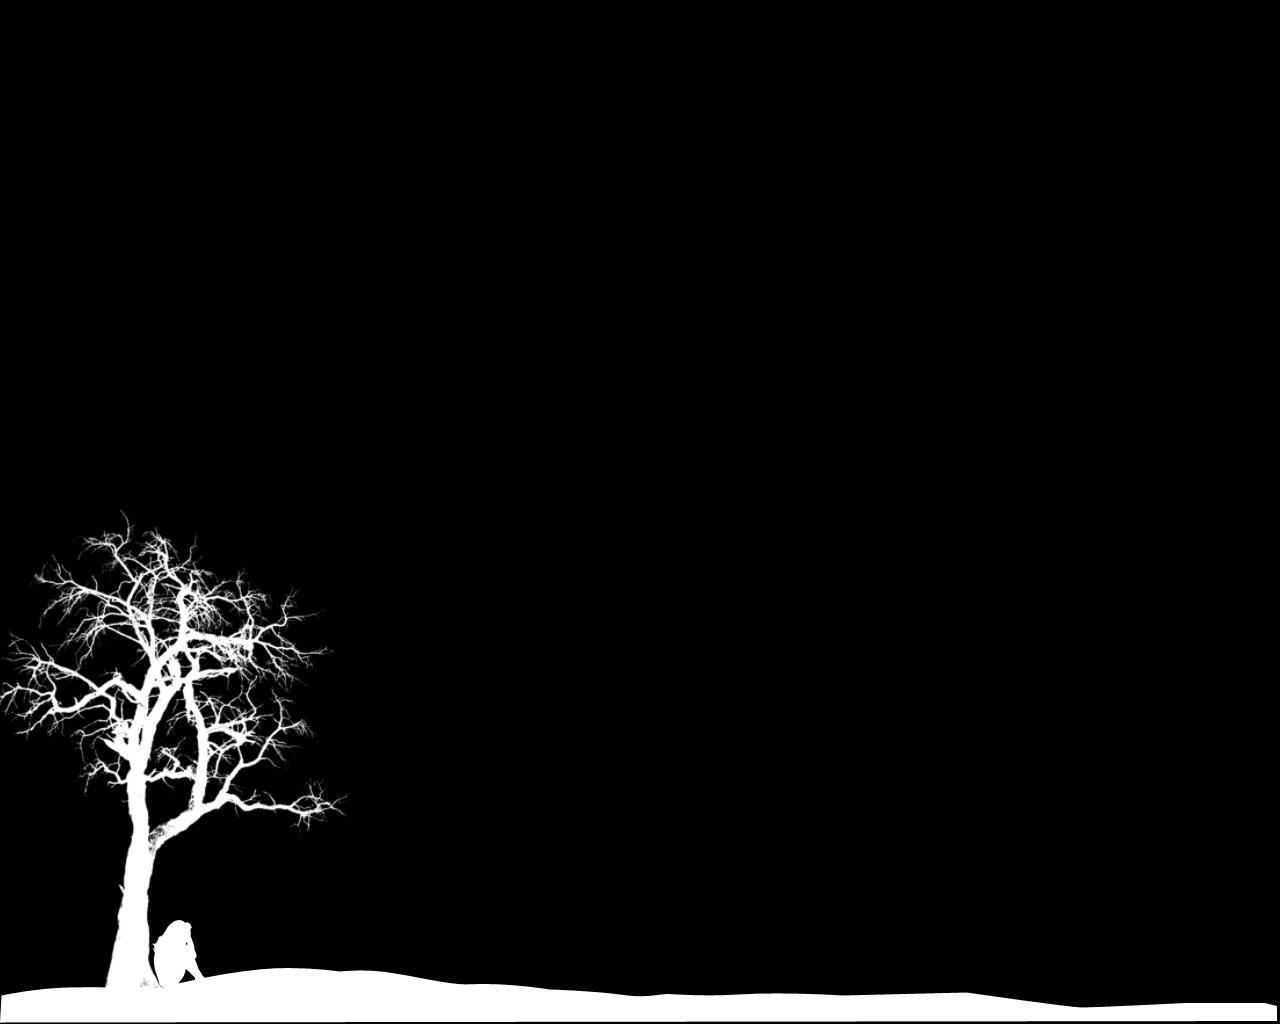 dark sadness wallpaper background - photo #13